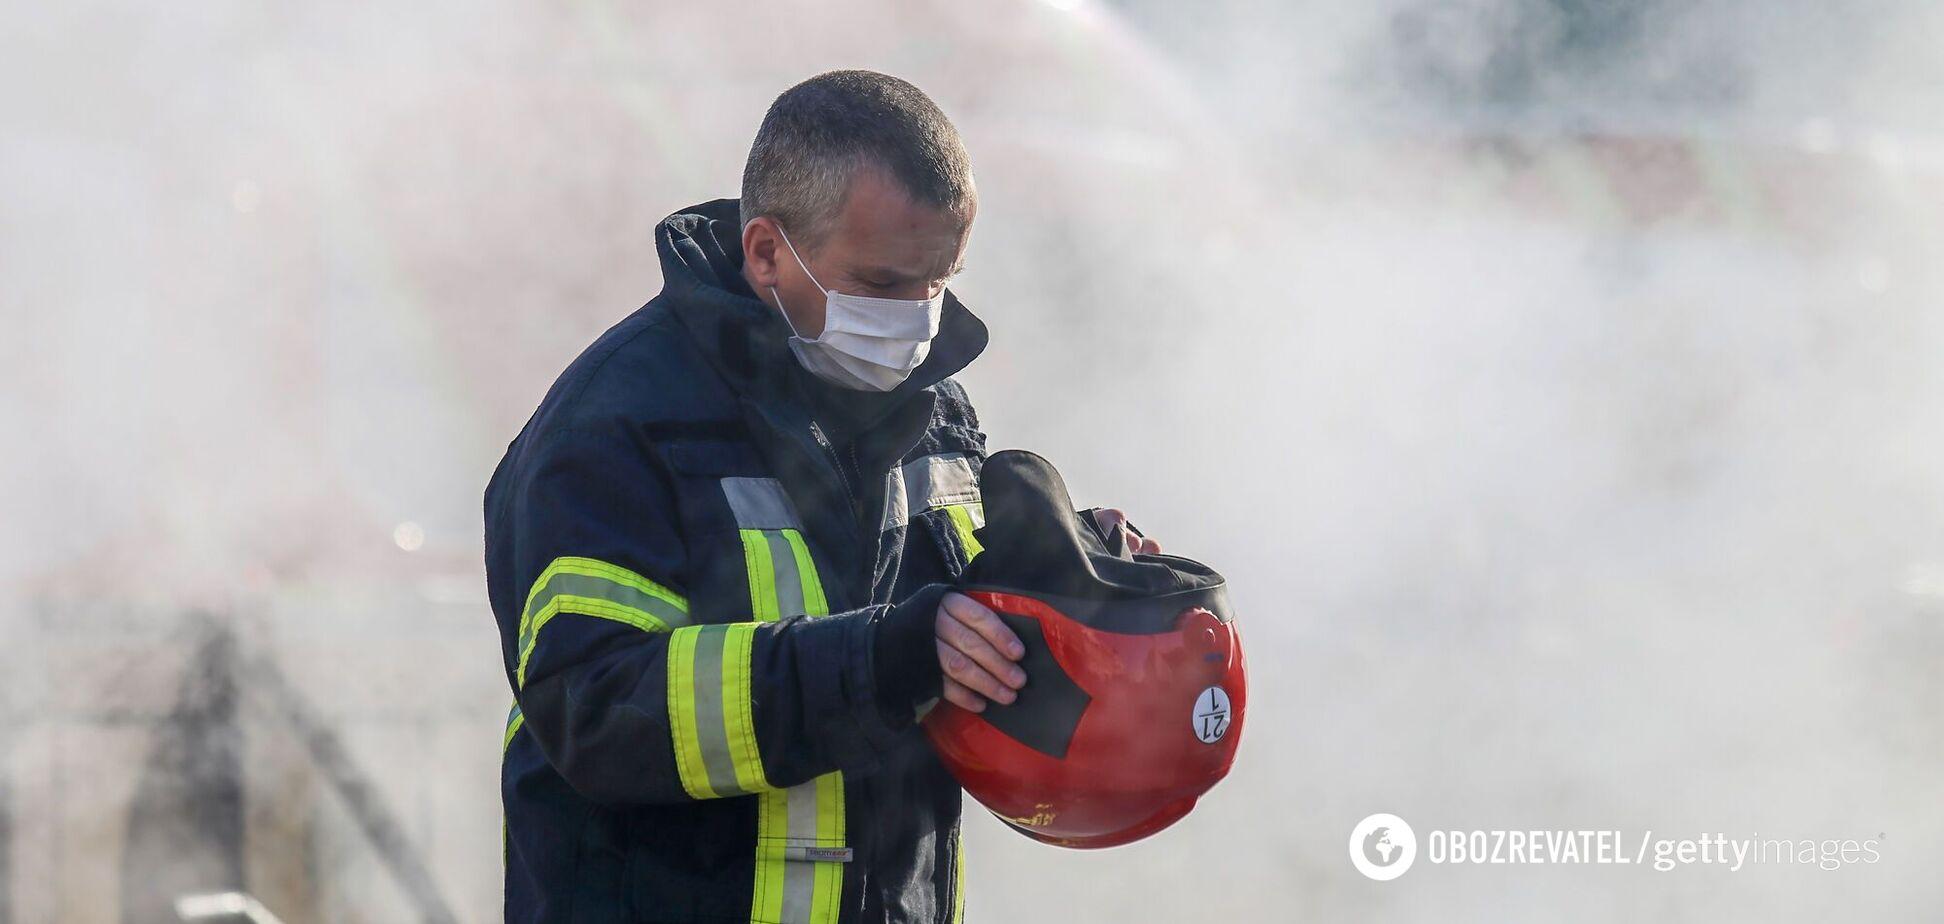 Огонь оперативно потушили спасатели